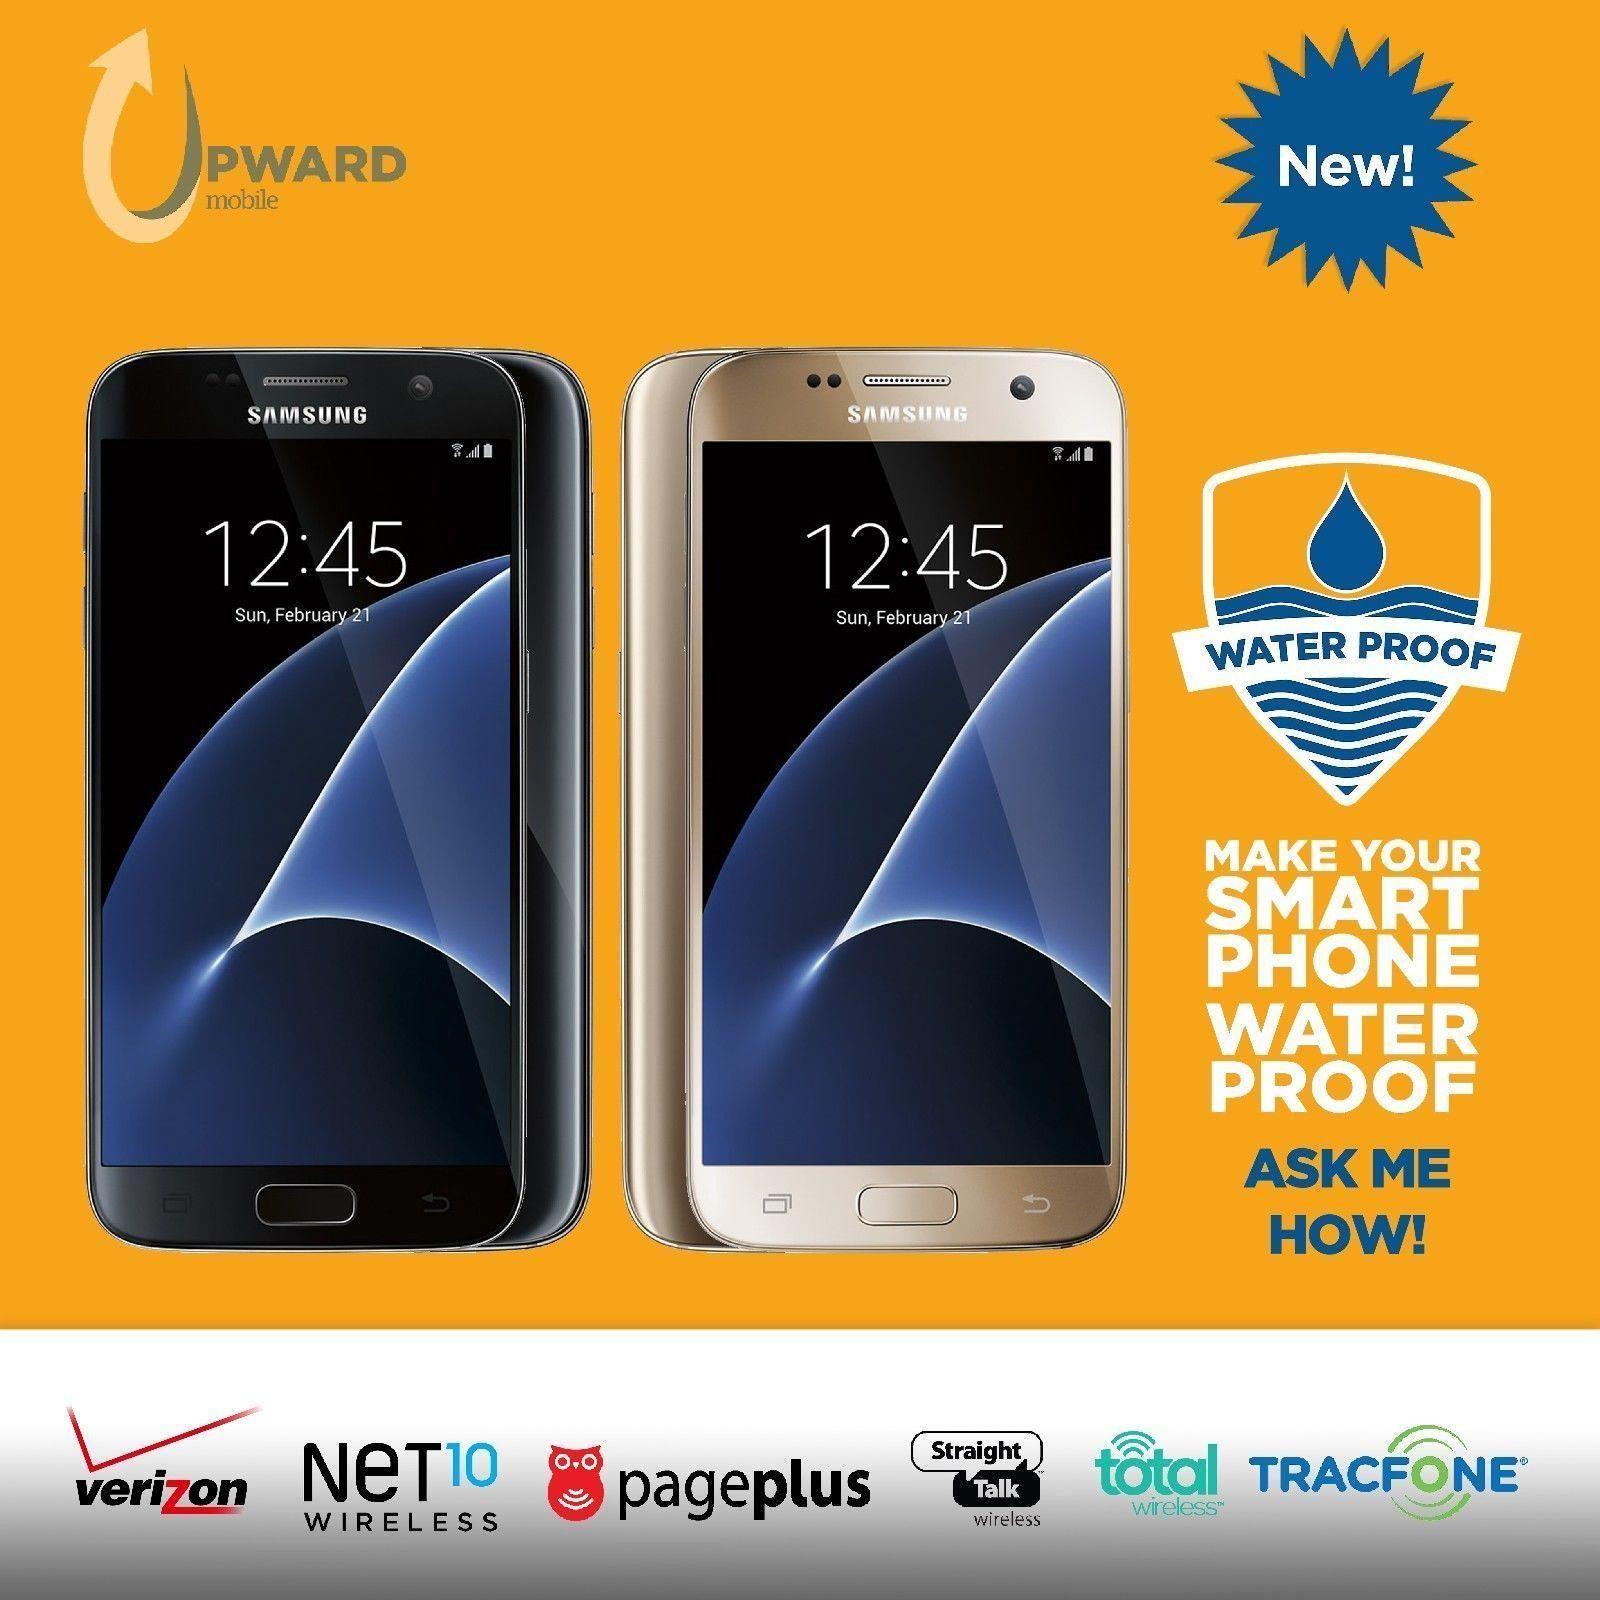 Samsung Galaxy S7 32GB Verizon Straight Talk Net10 PagePlus Tracfone